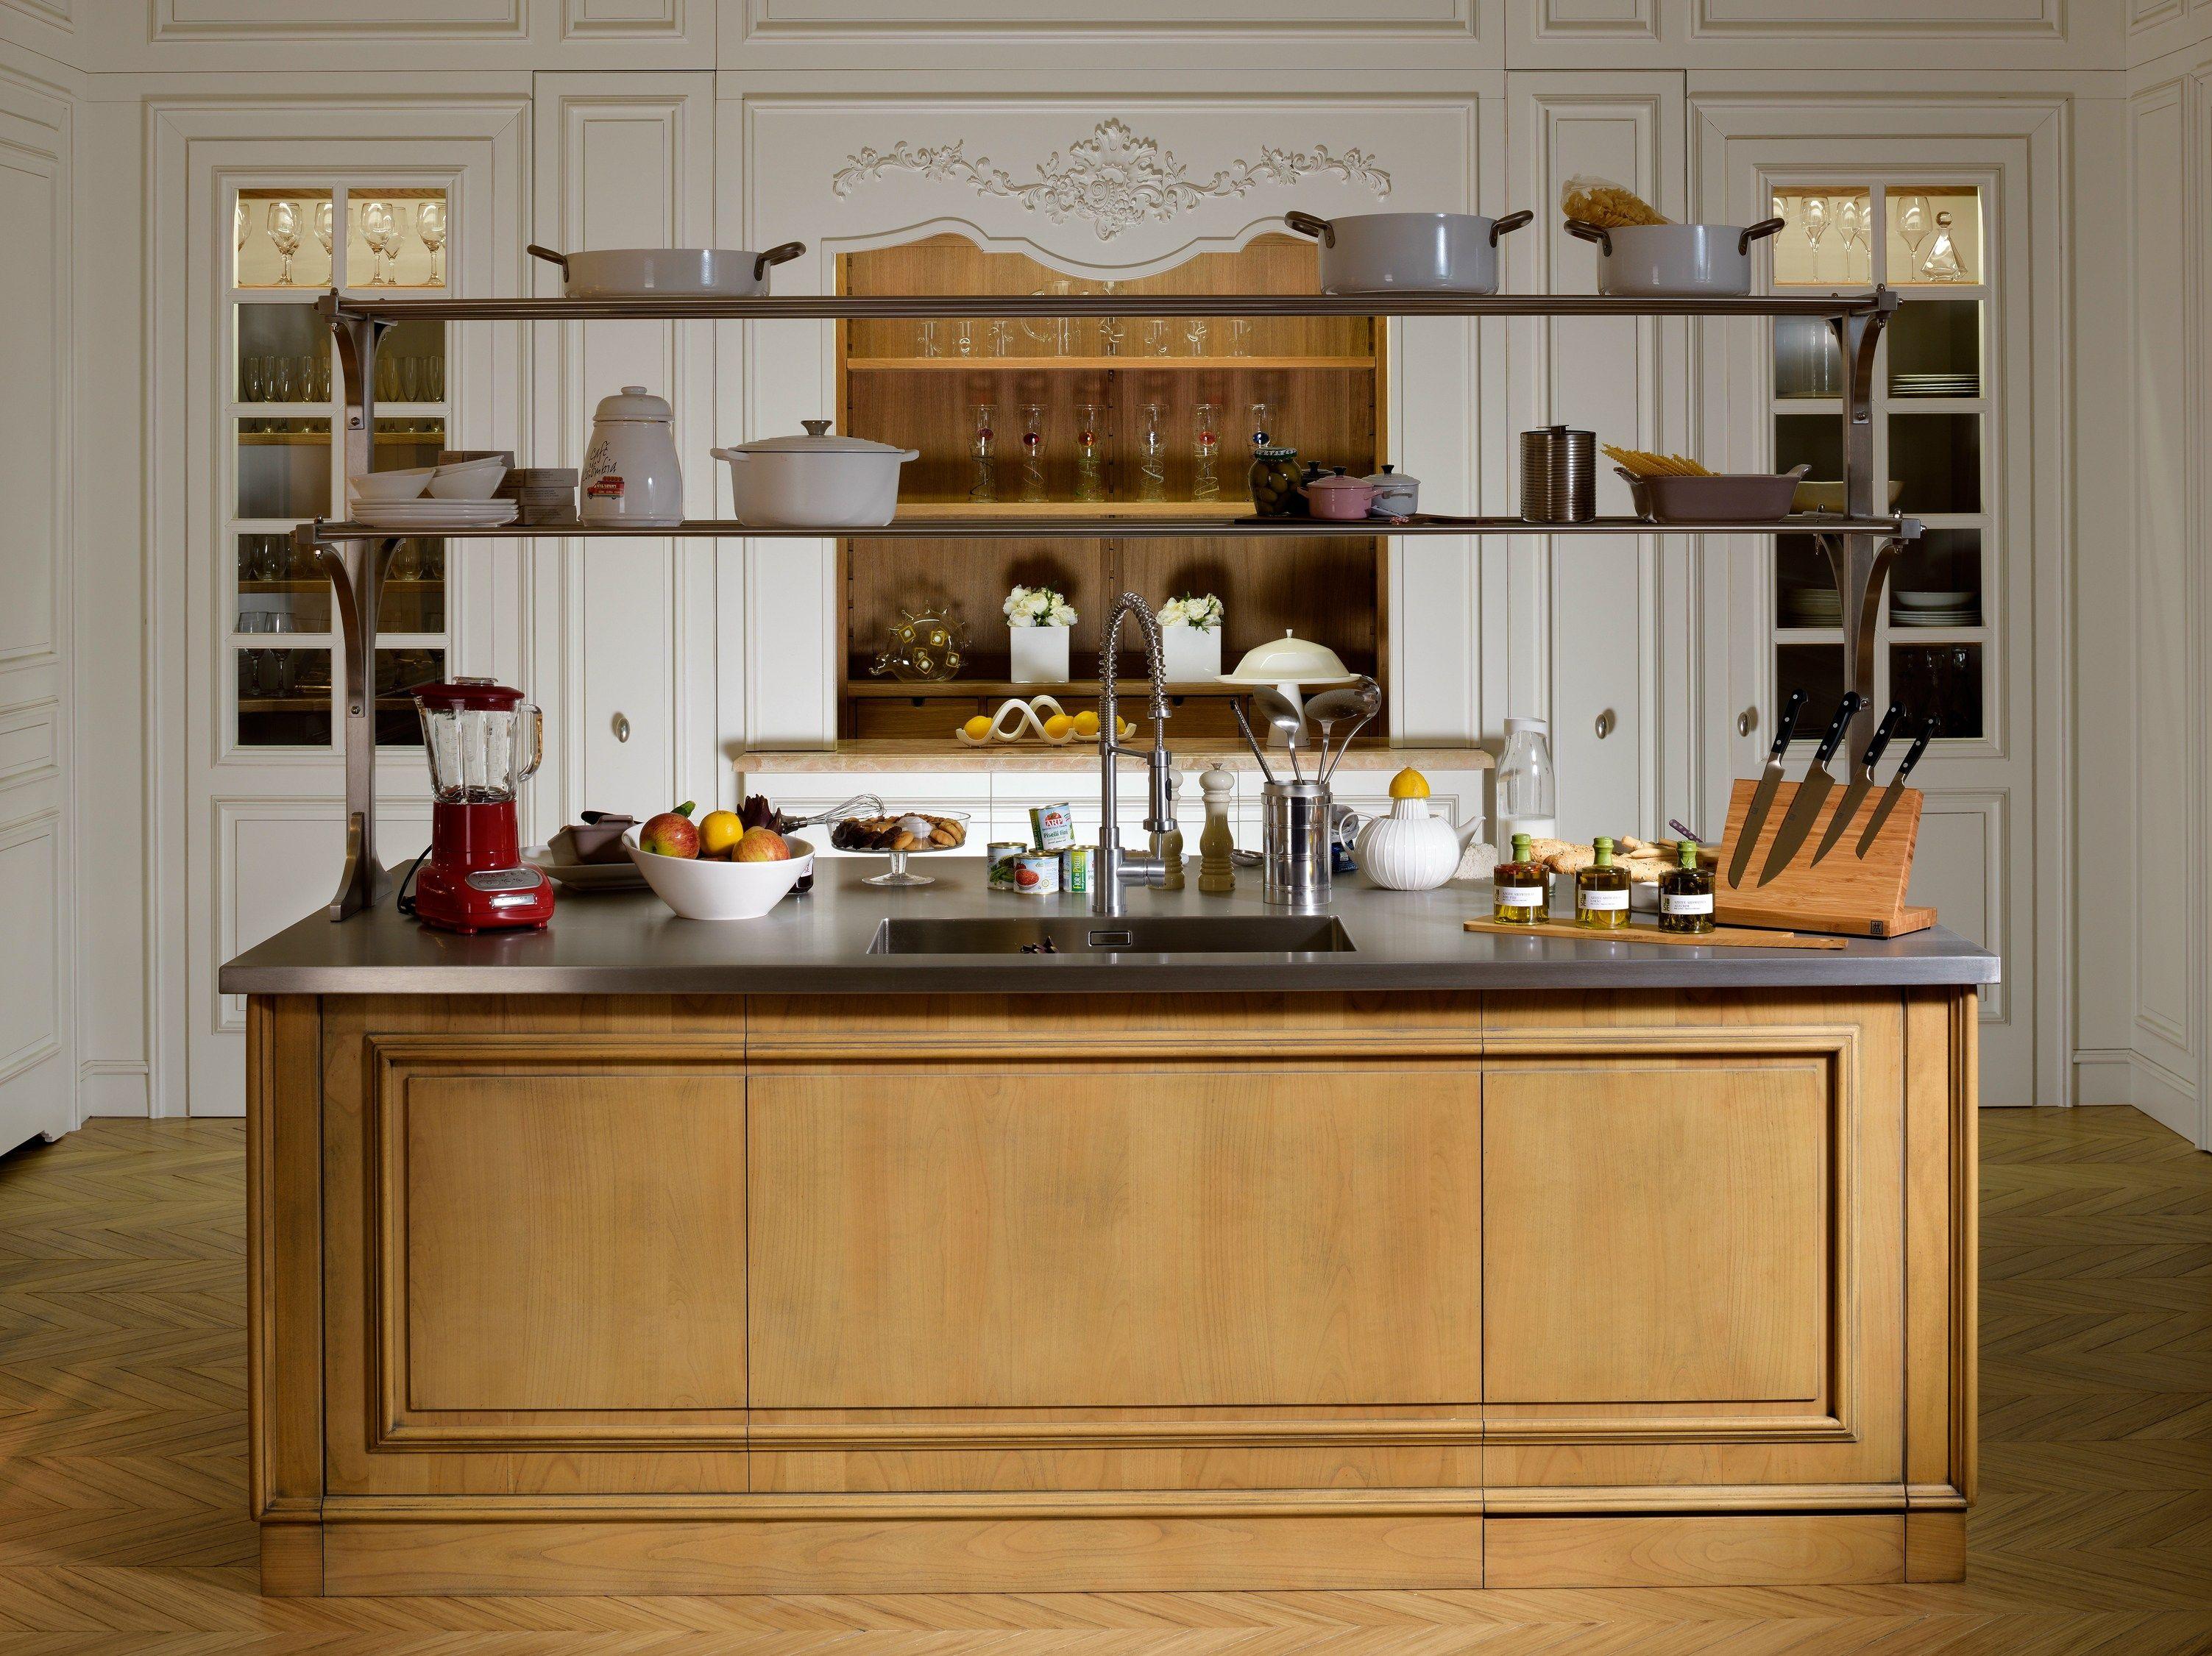 Awesome L Ottocento Cucina Photos - bery.us - bery.us